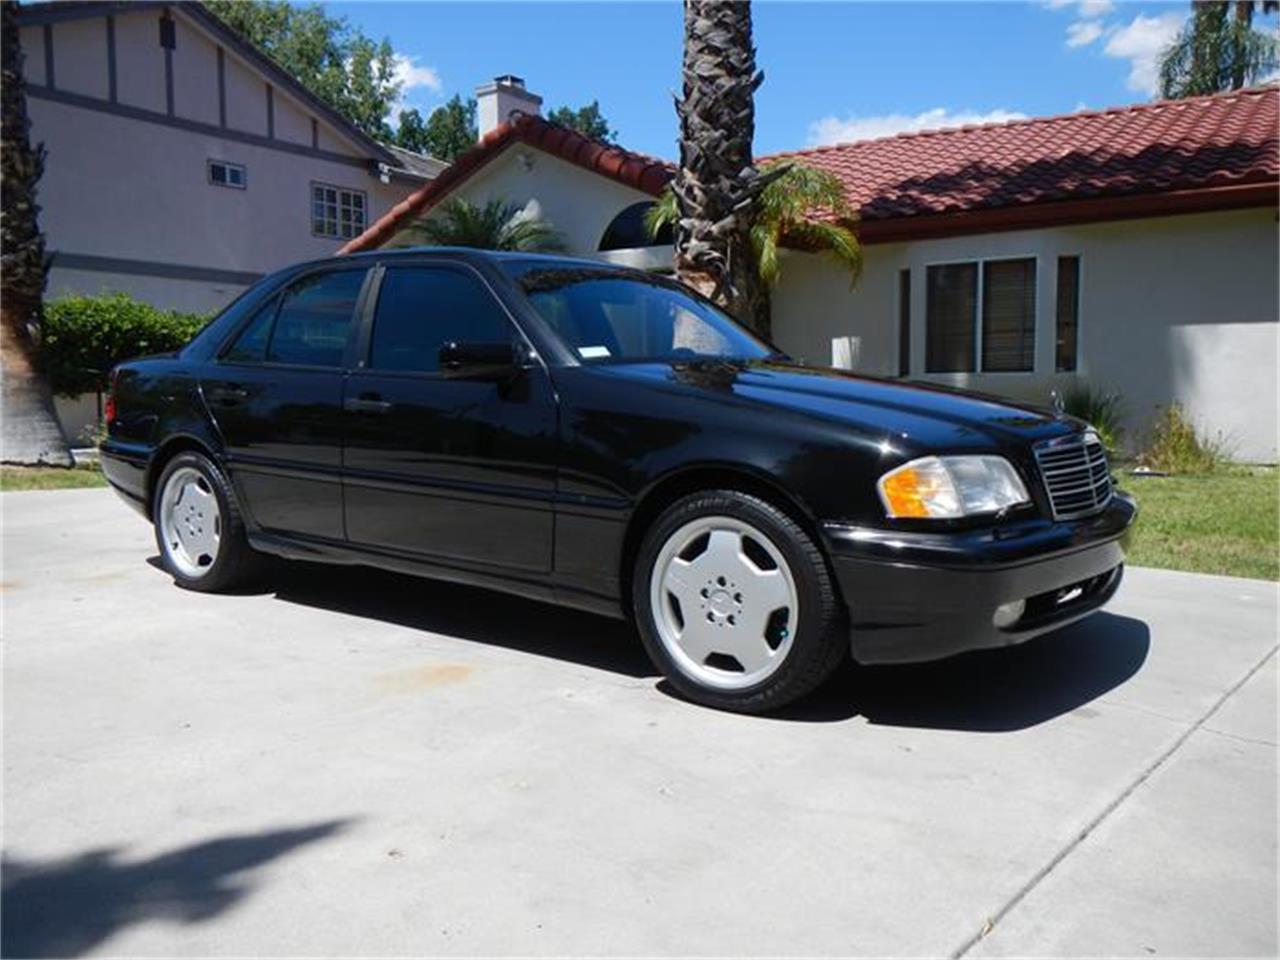 1999 Mercedes Benz C43 Amg For Sale Classiccars Com Cc 817244